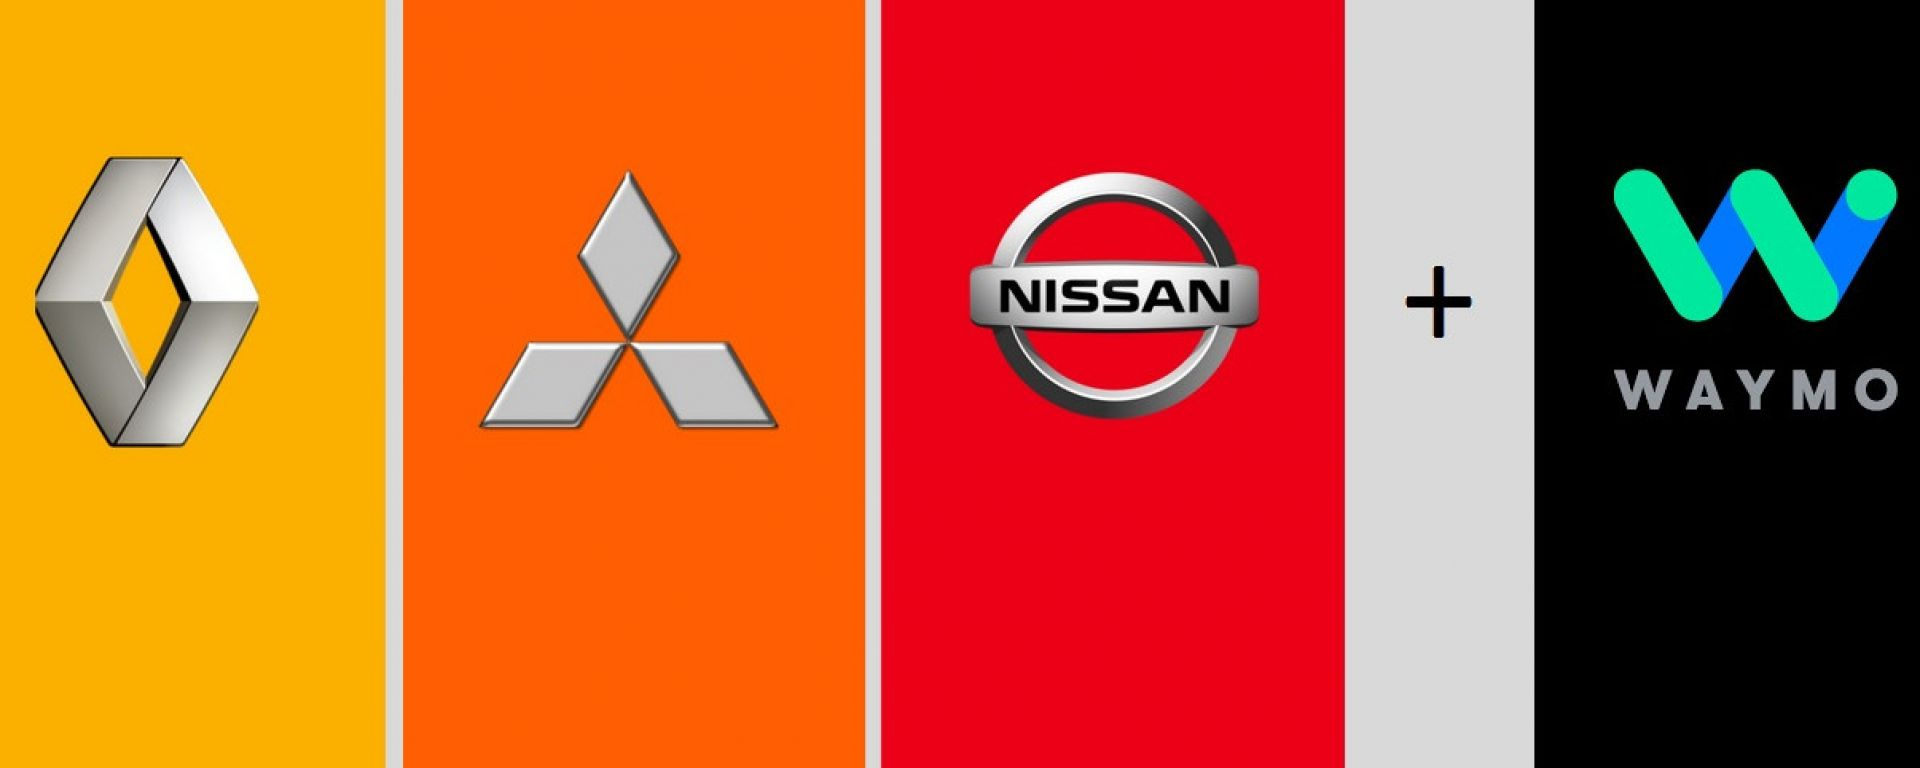 Renault-Nissan, accordo con Waymo. Bypassata FCA?